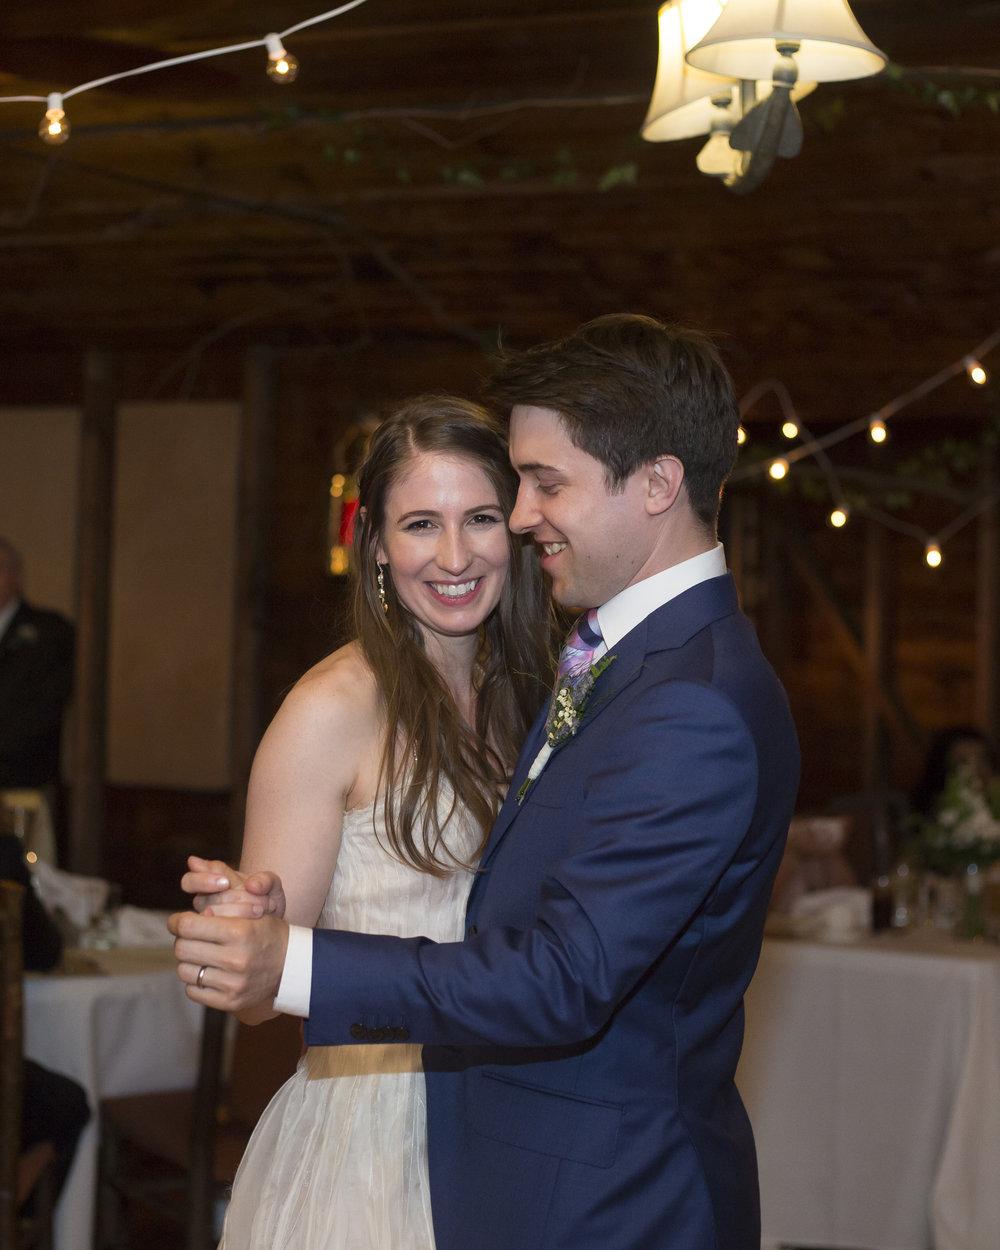 web-image-wedding-0038.jpg